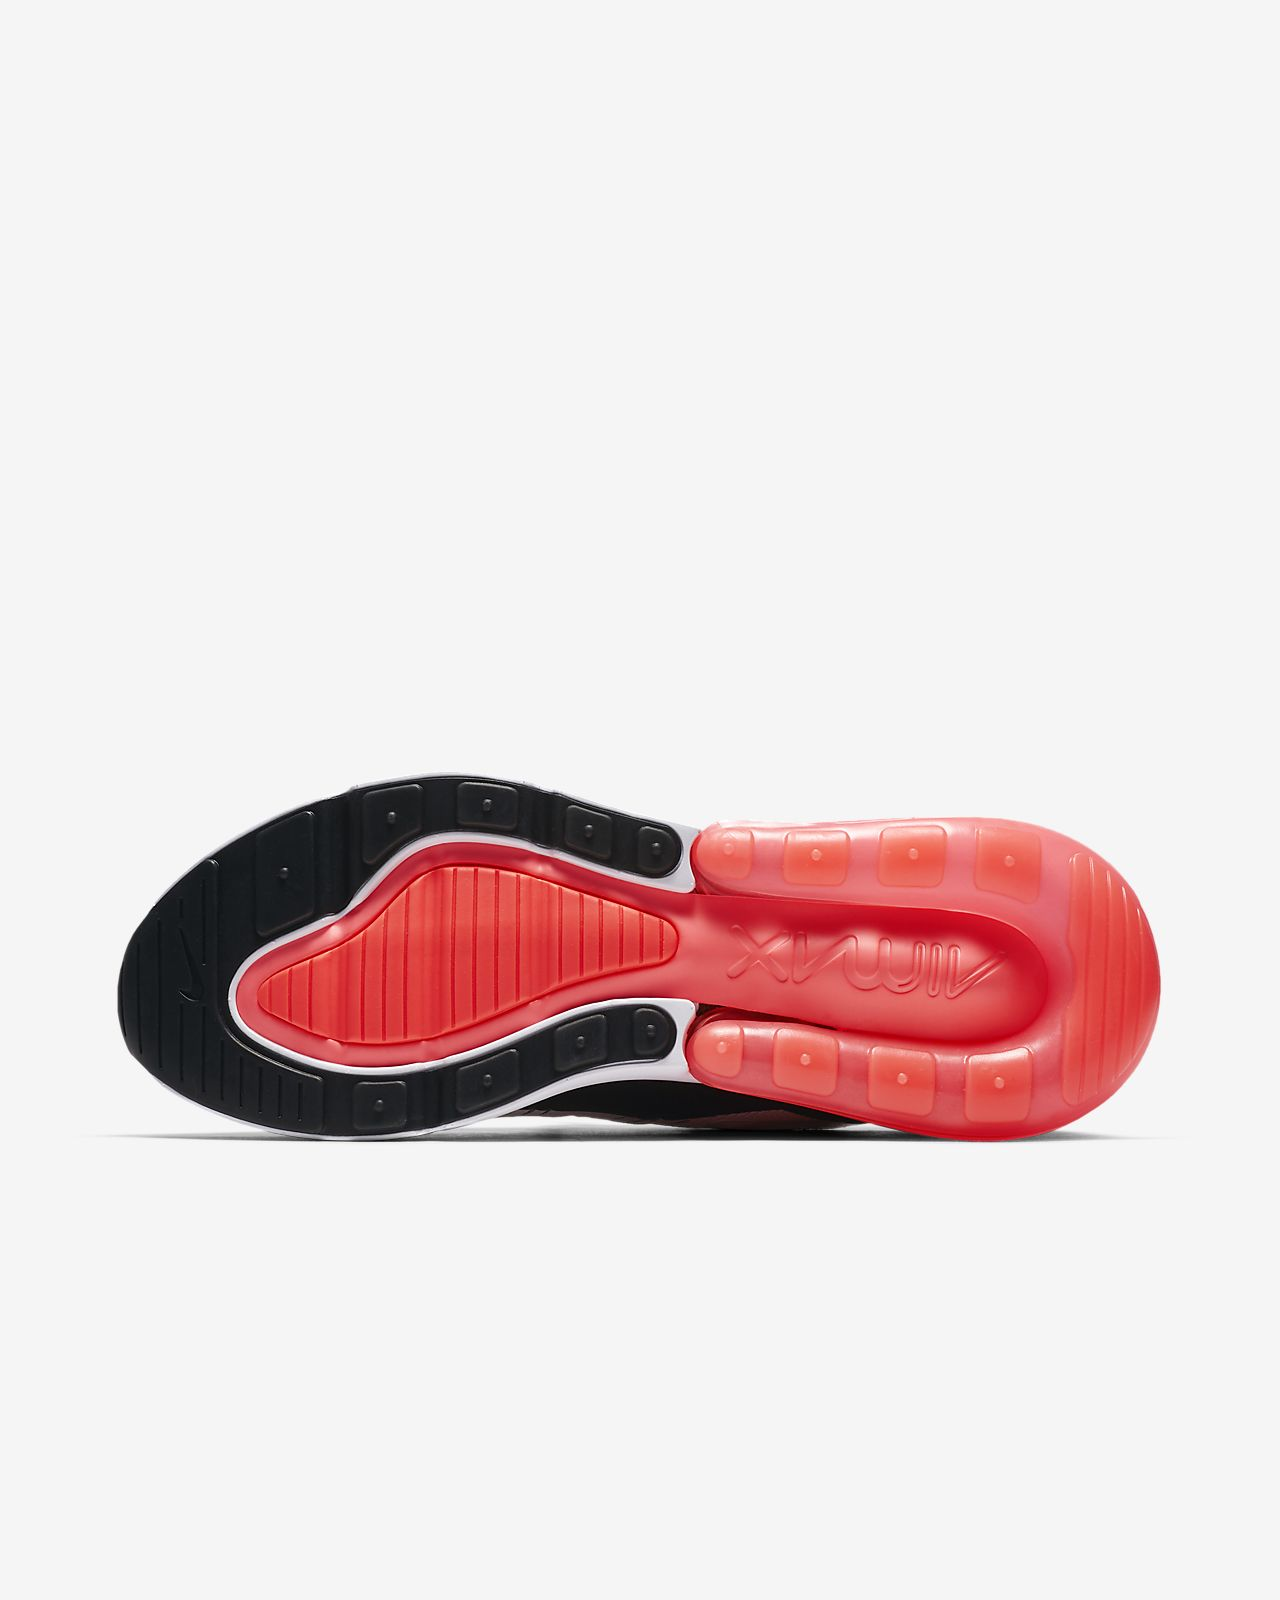 nike damaged skor return, Alla Röda Nike Air Max 90